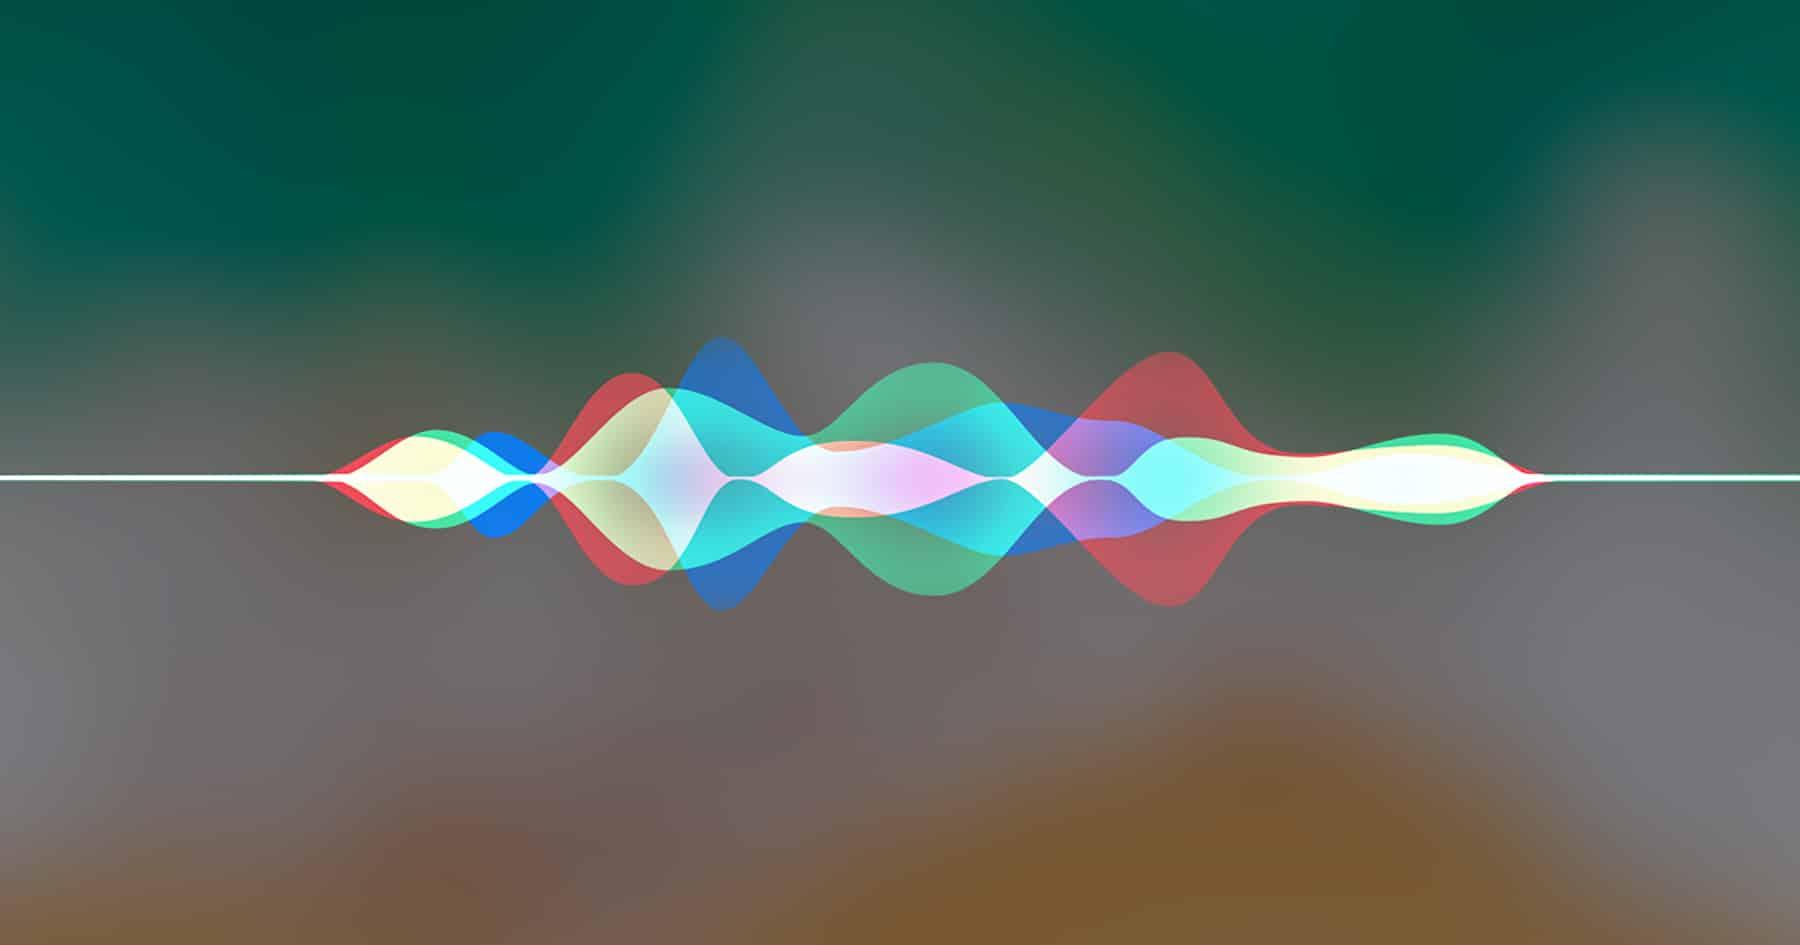 Voice Prototypes in App Design